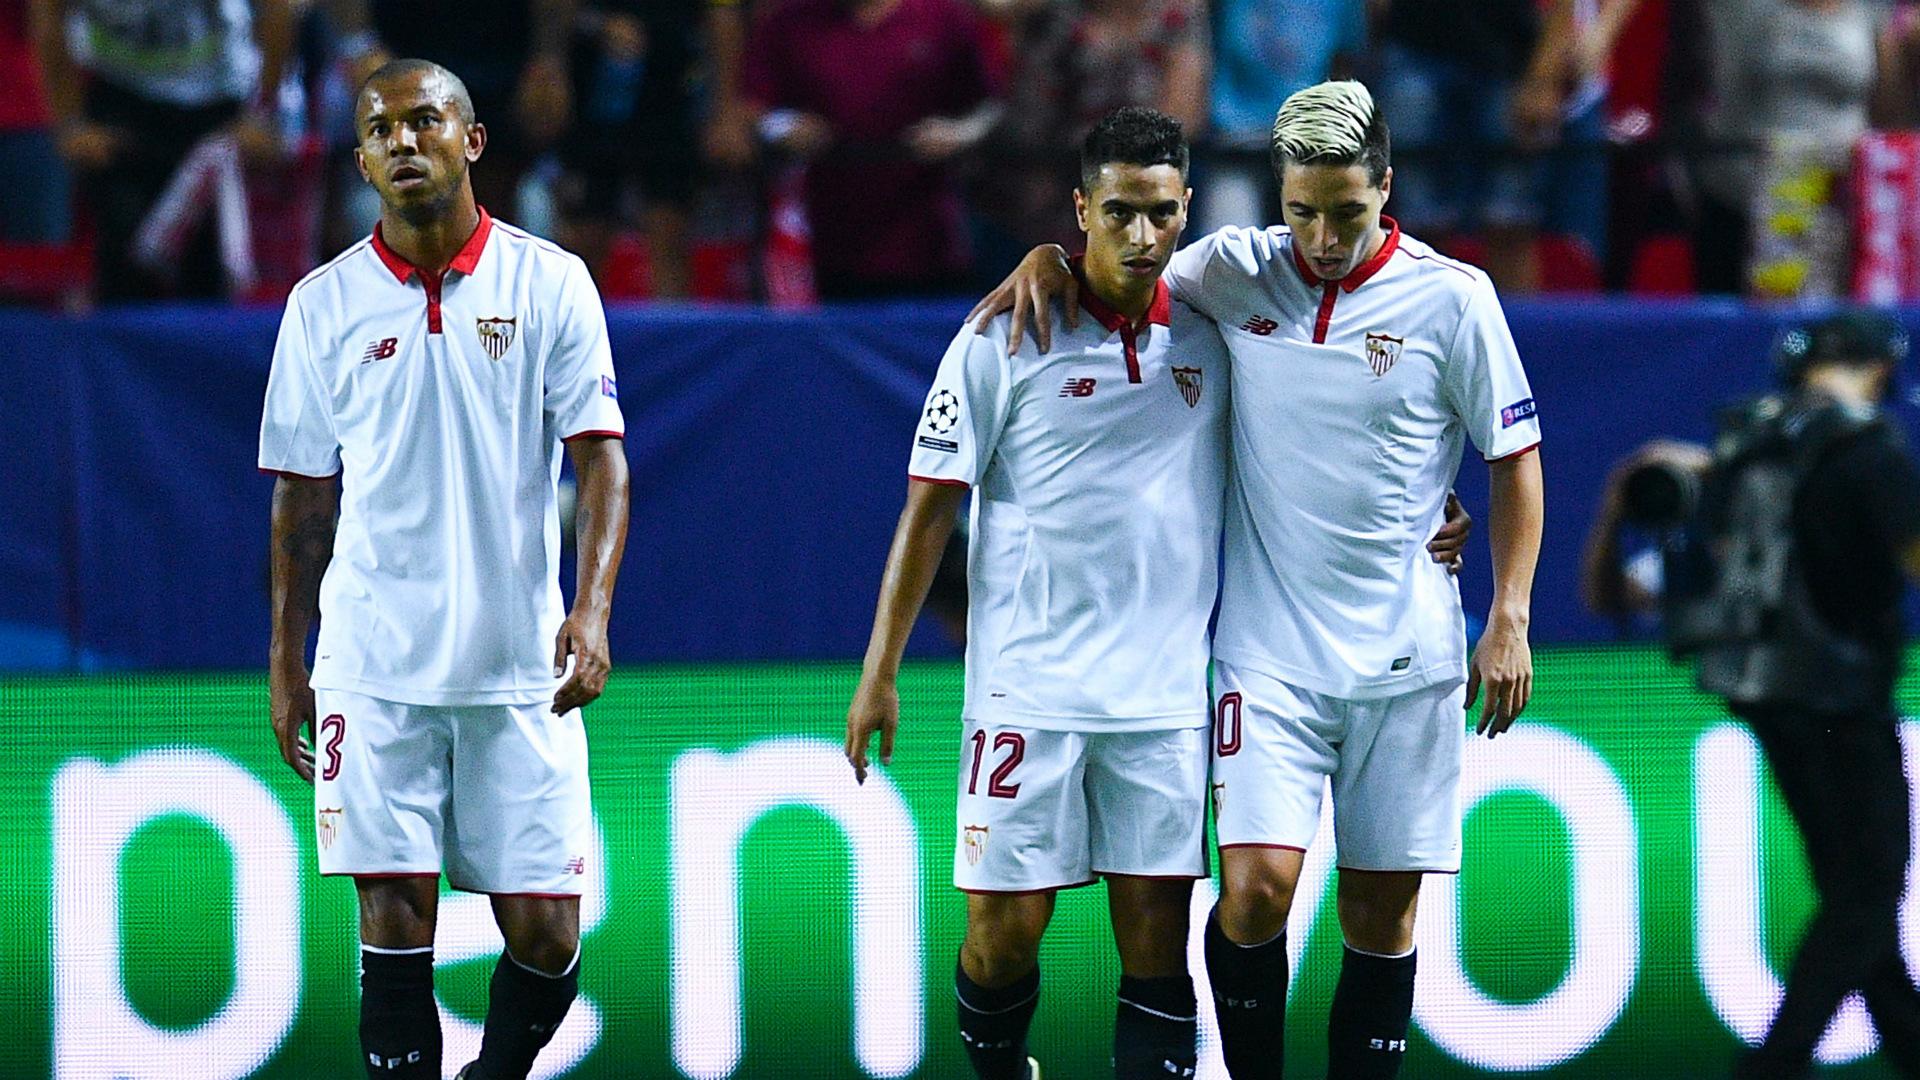 Wissam Ben Yedder Samir Nasri Sevilla Olympique Lyonnais UEFA Champions League